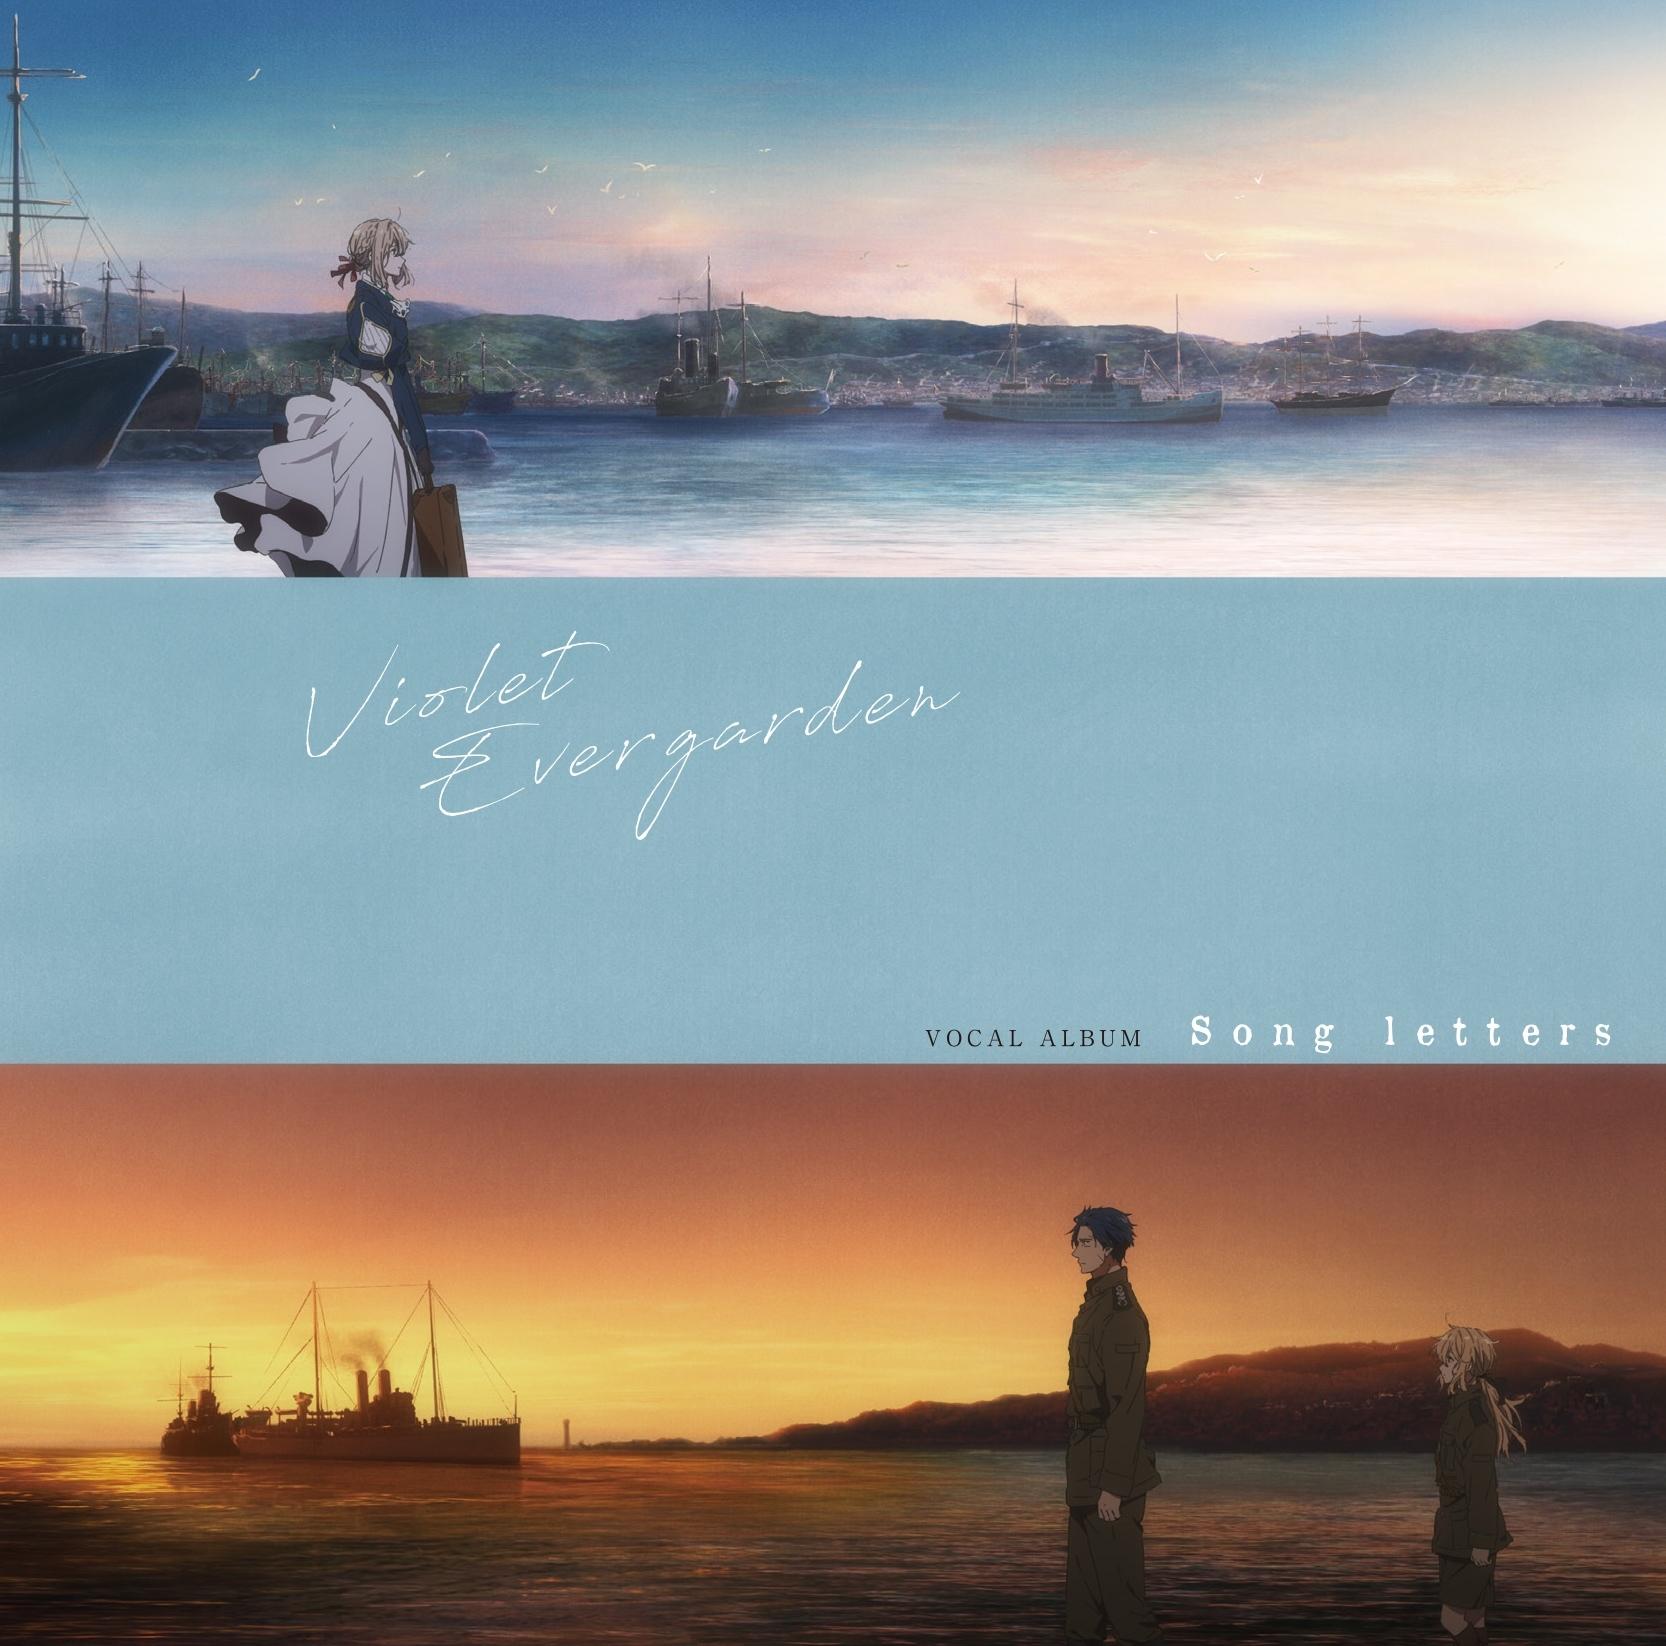 TVアニメ 『ヴァイオレット・エヴァーガーデン』 ボーカルアルバム Song letters